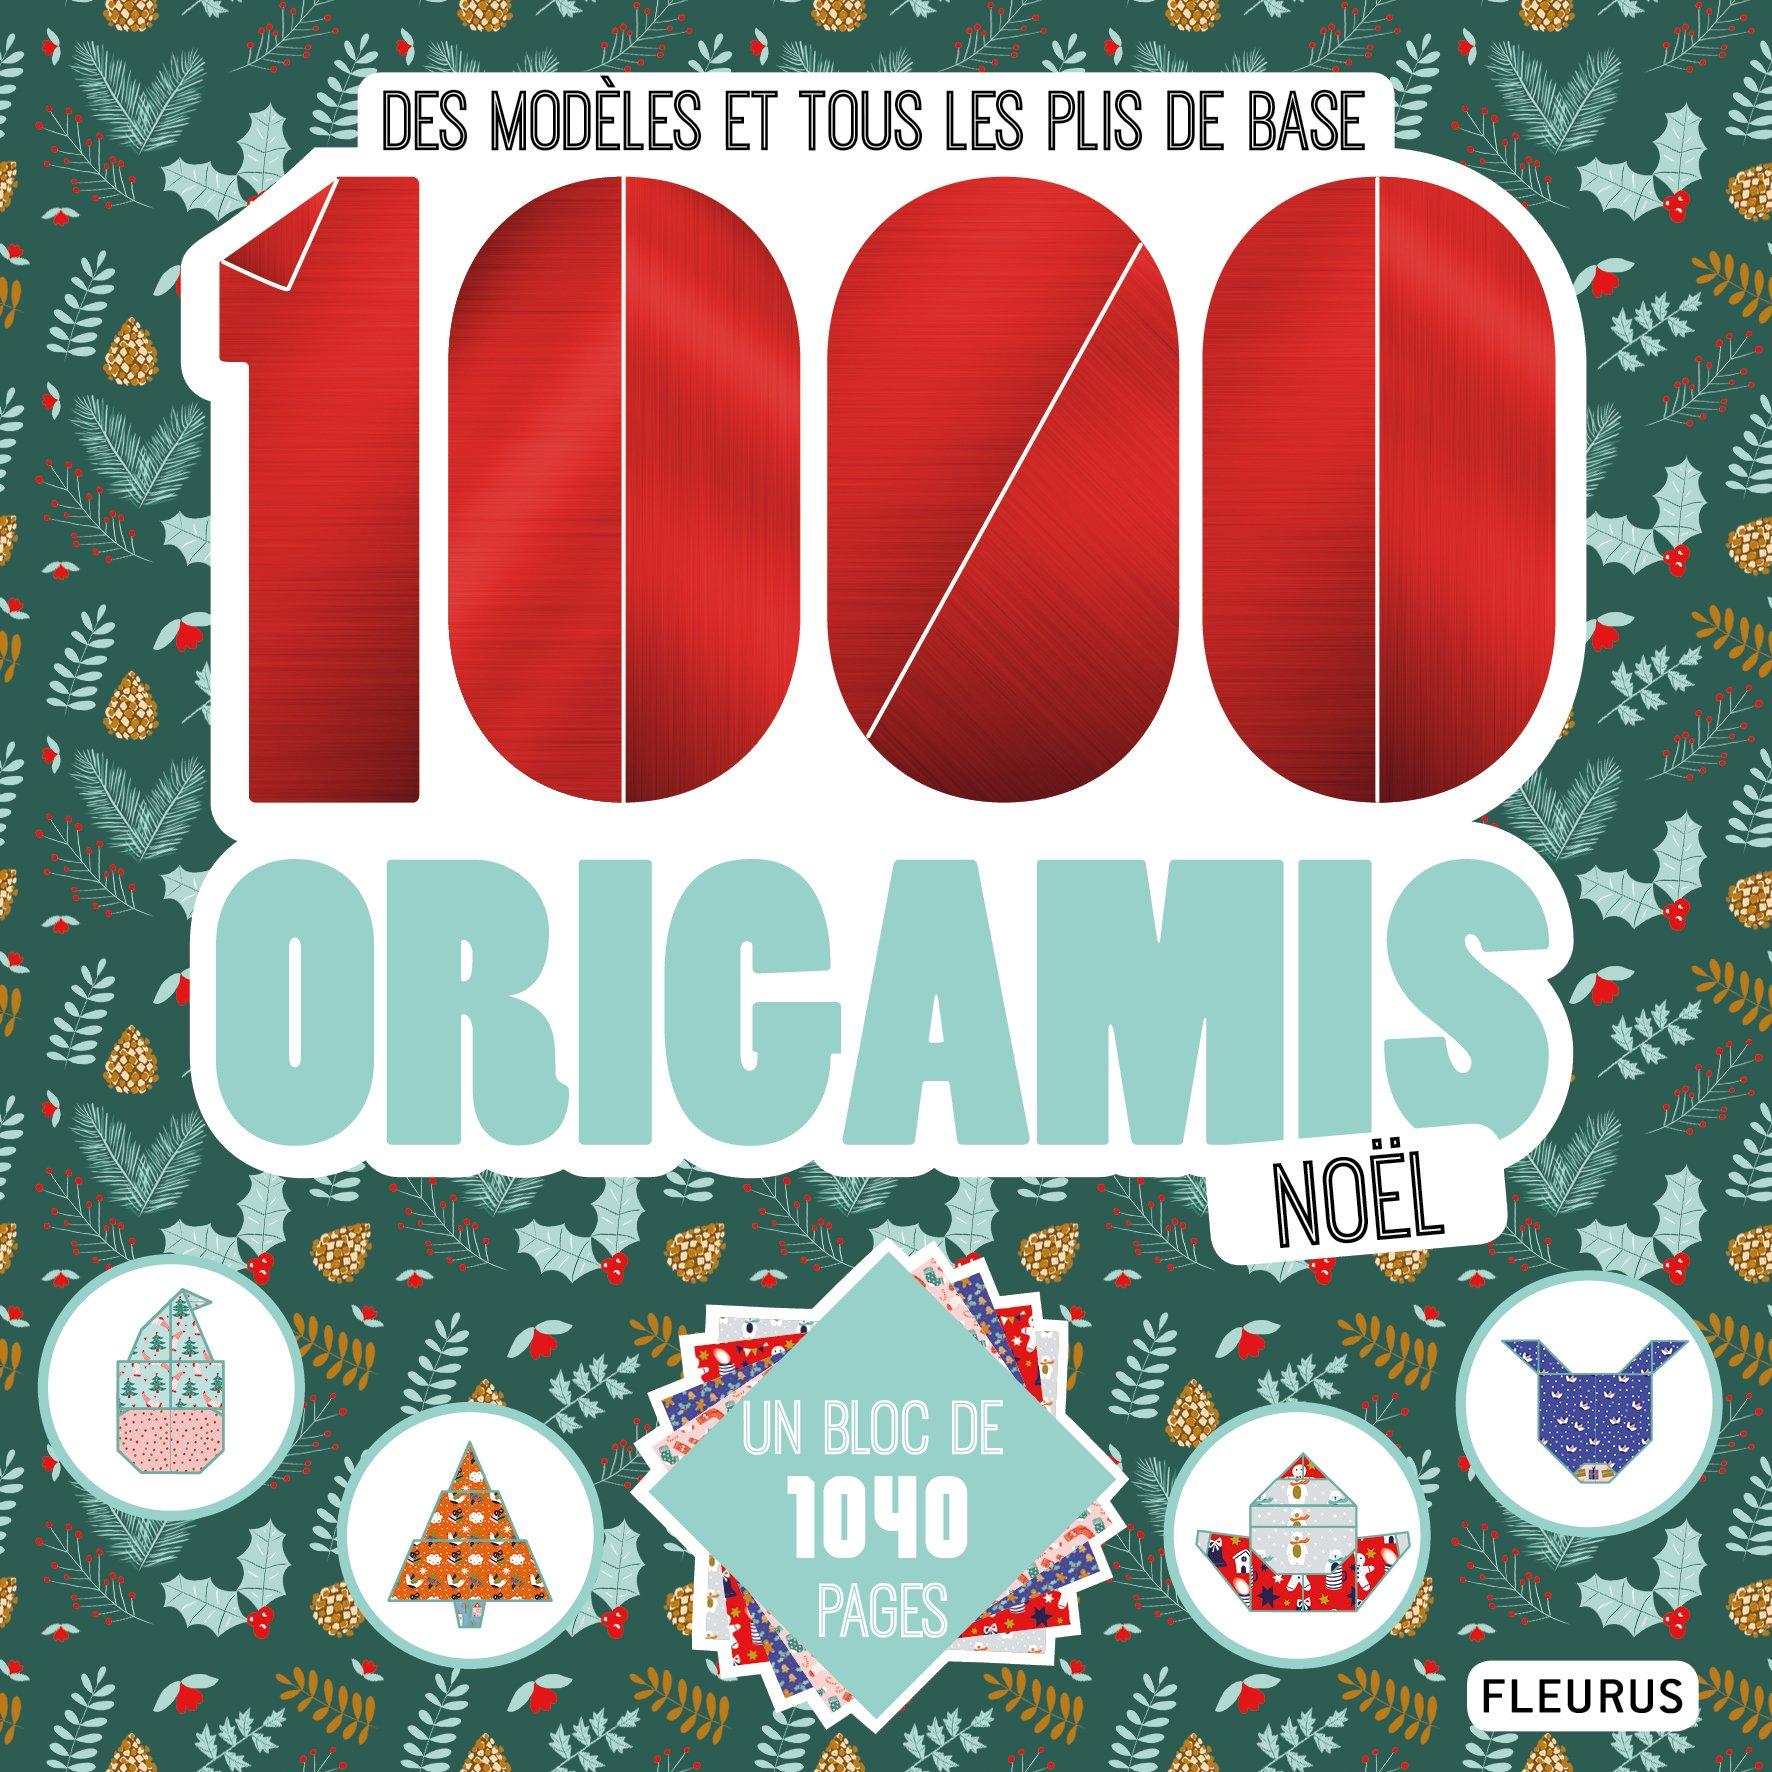 1 000 origamis Noël